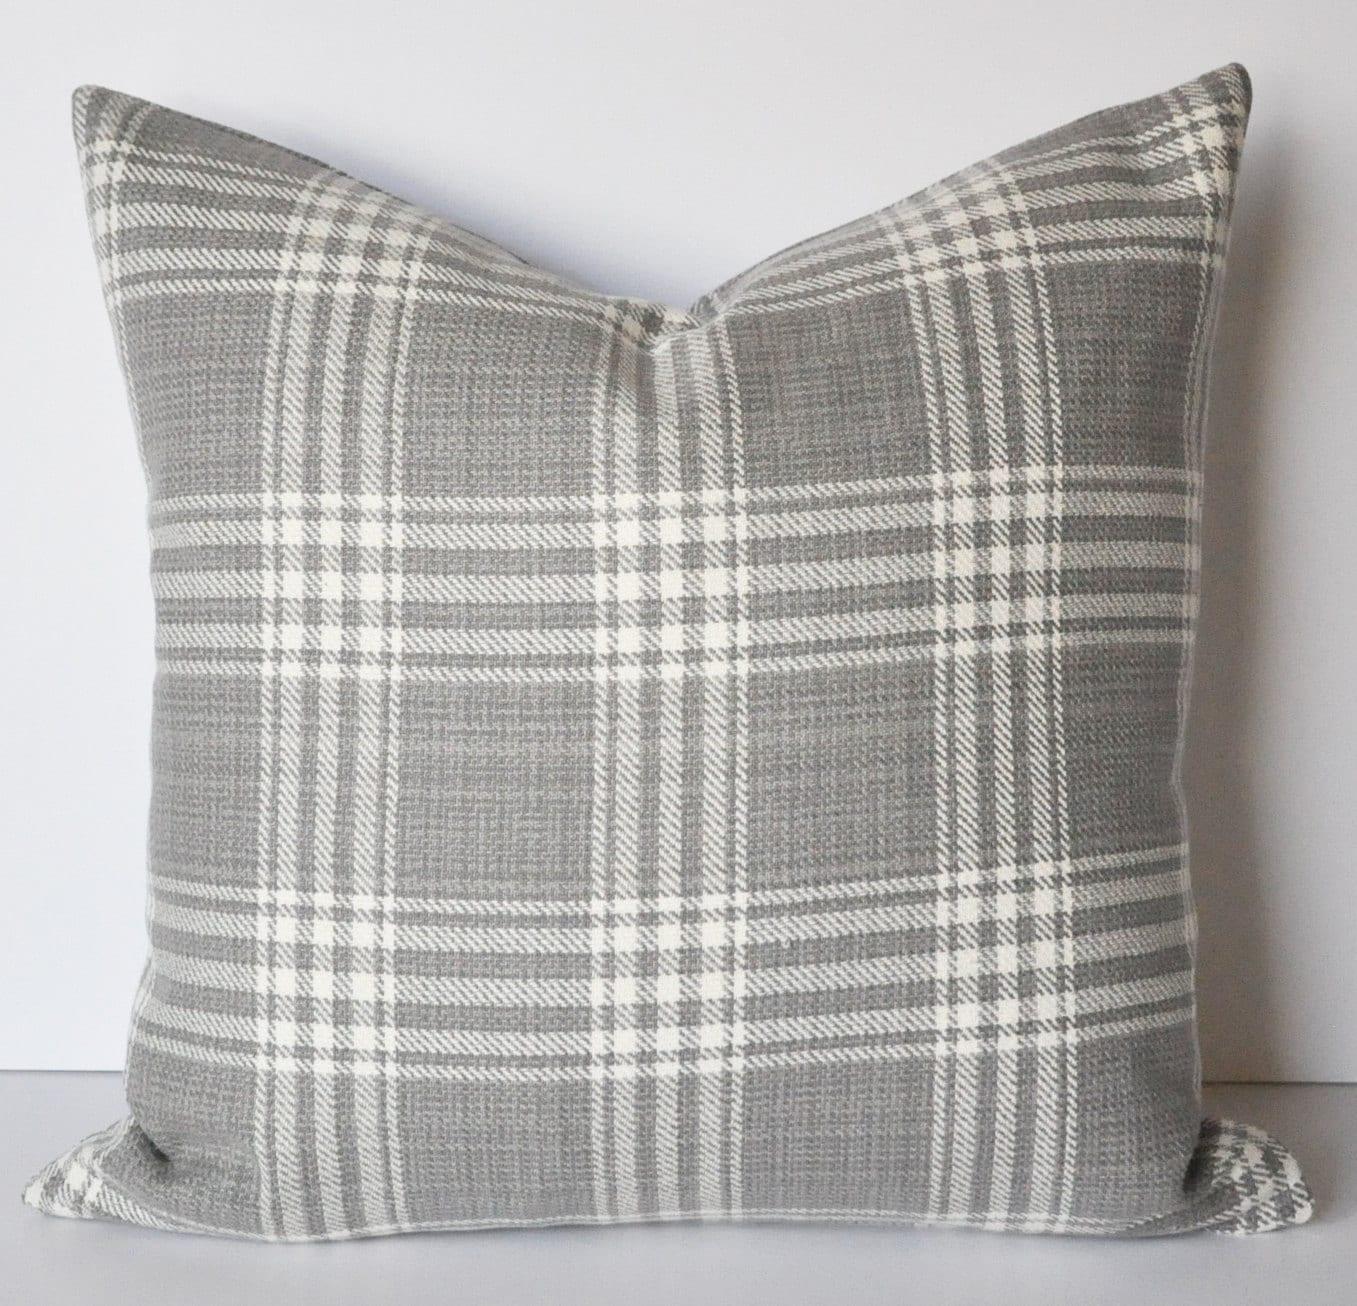 Plaid Pillow Cover Gray And White Plaid Buffalo Plaid